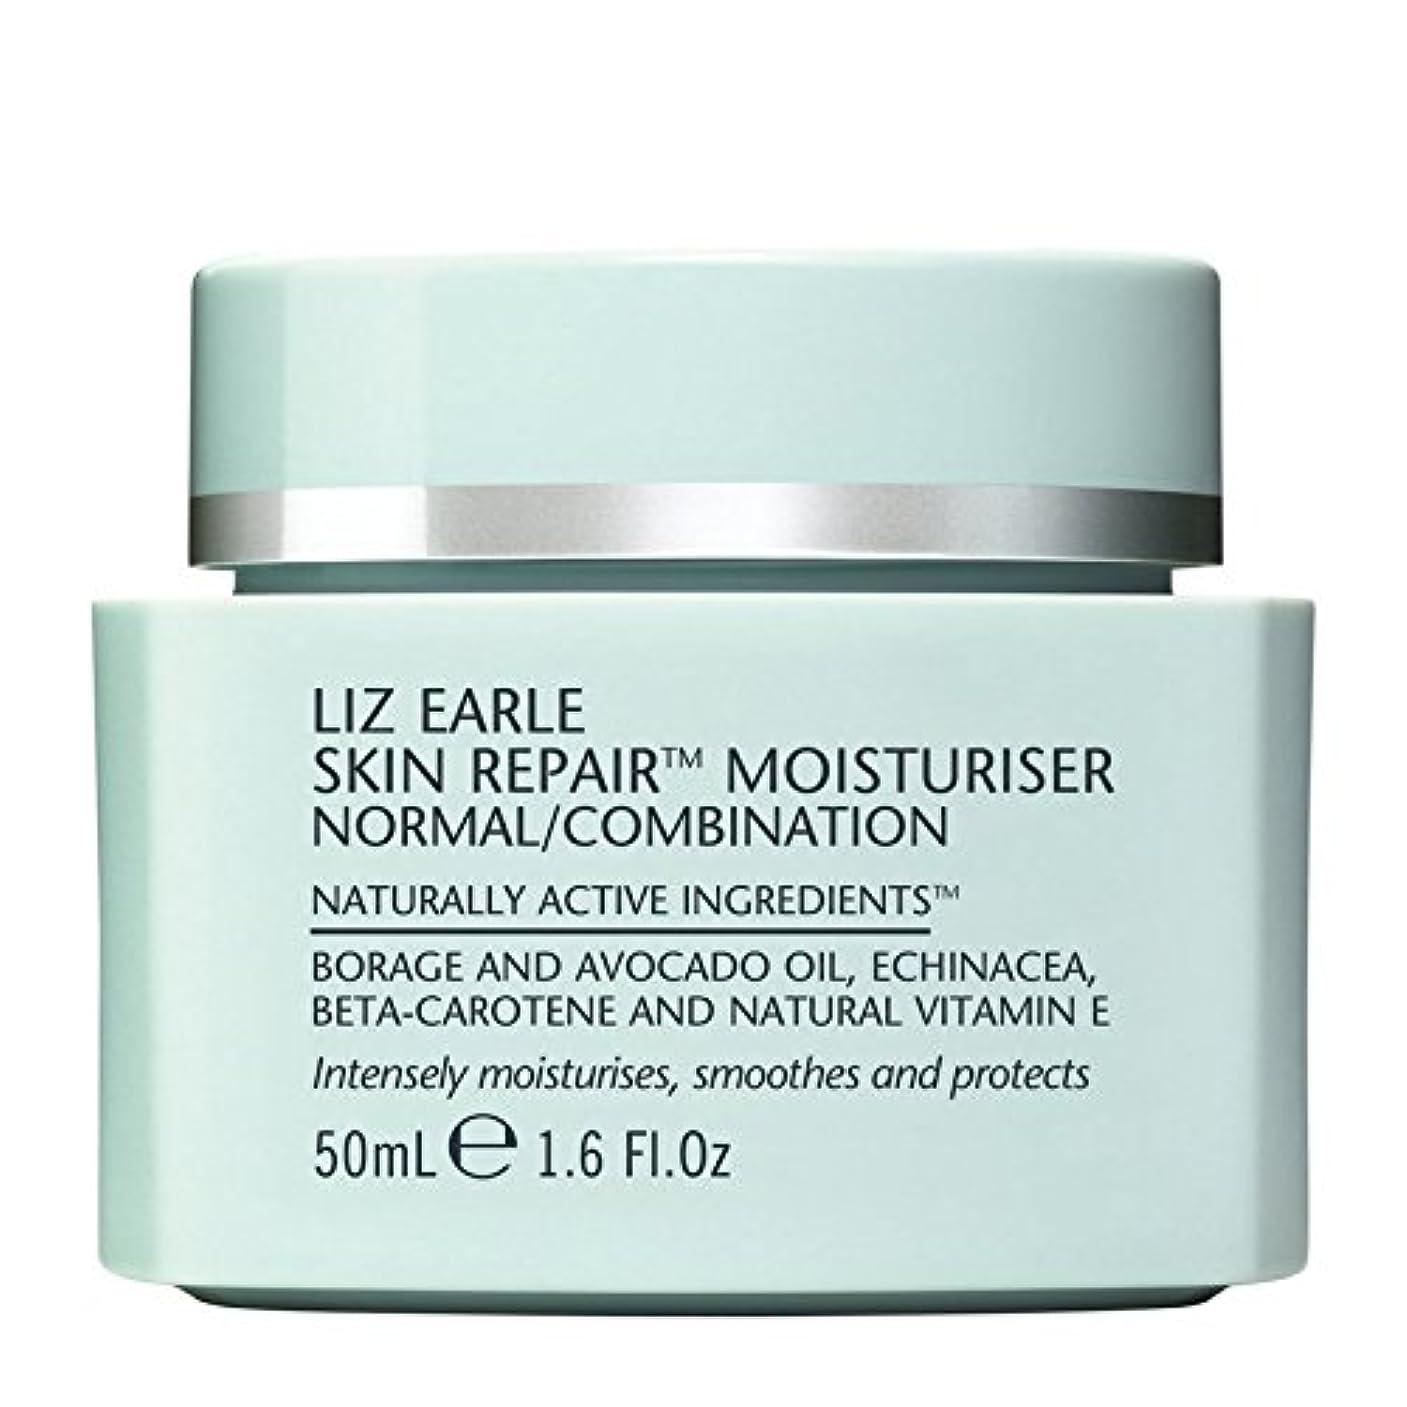 Liz Earle Skin Repair Moisturiser Normal/Combination 50ml - リズアールスキンリペアモイスチャライザーノーマル/コンビネーション50ミリリットル [並行輸入品]